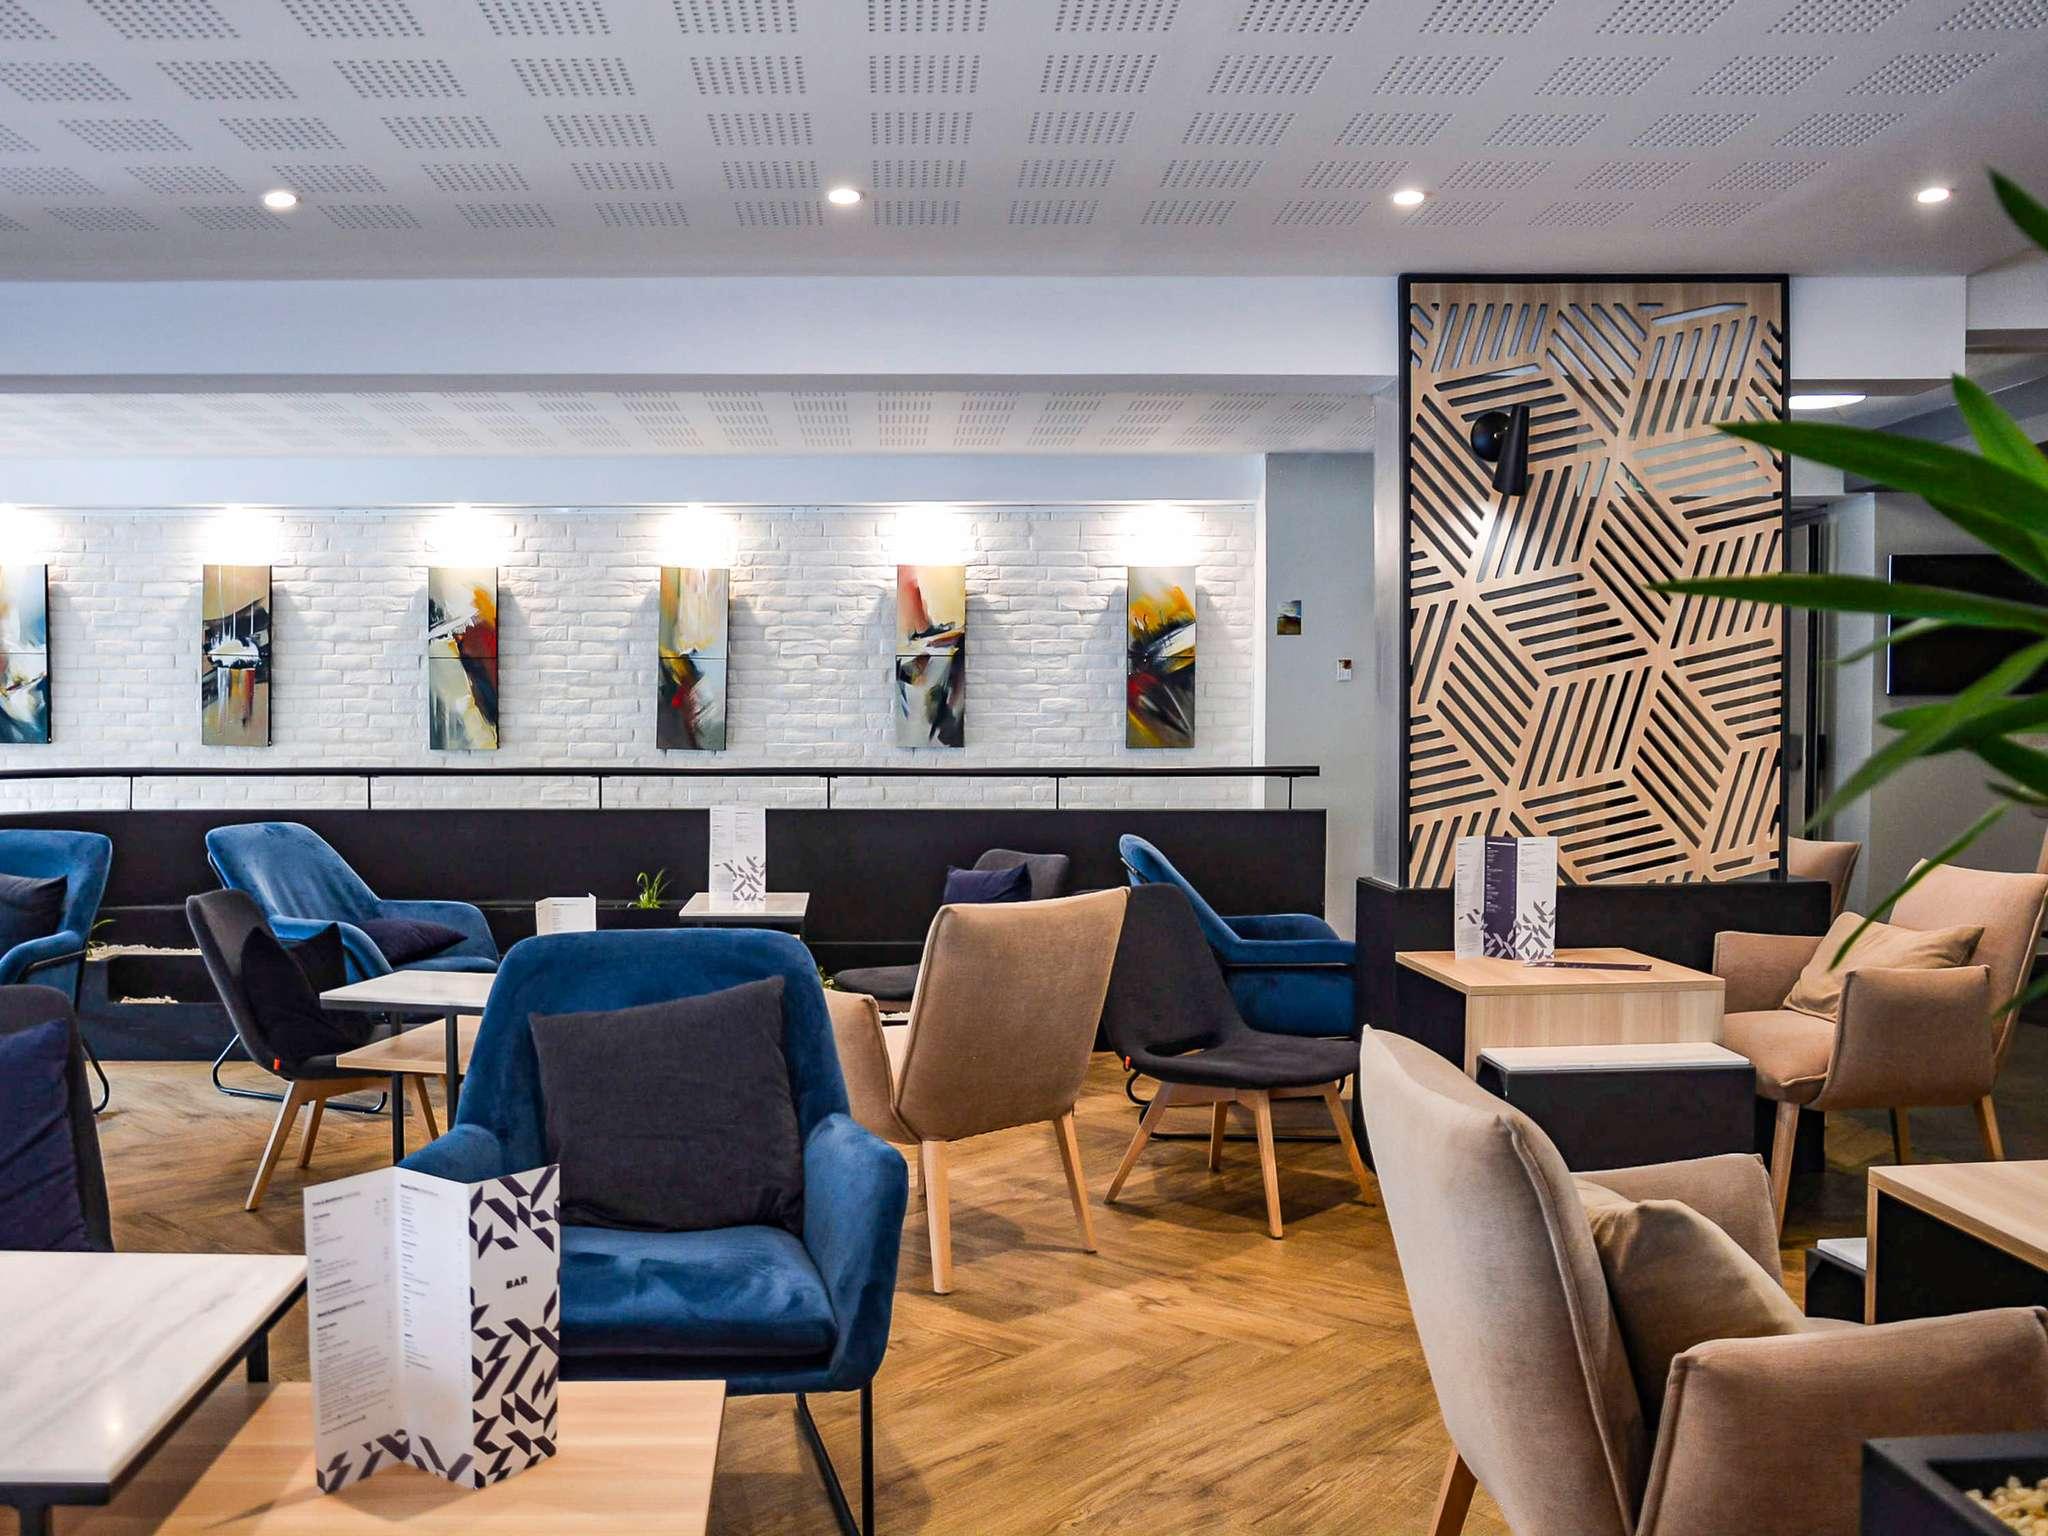 Hotel – Hotel Mercure Lorient Centre